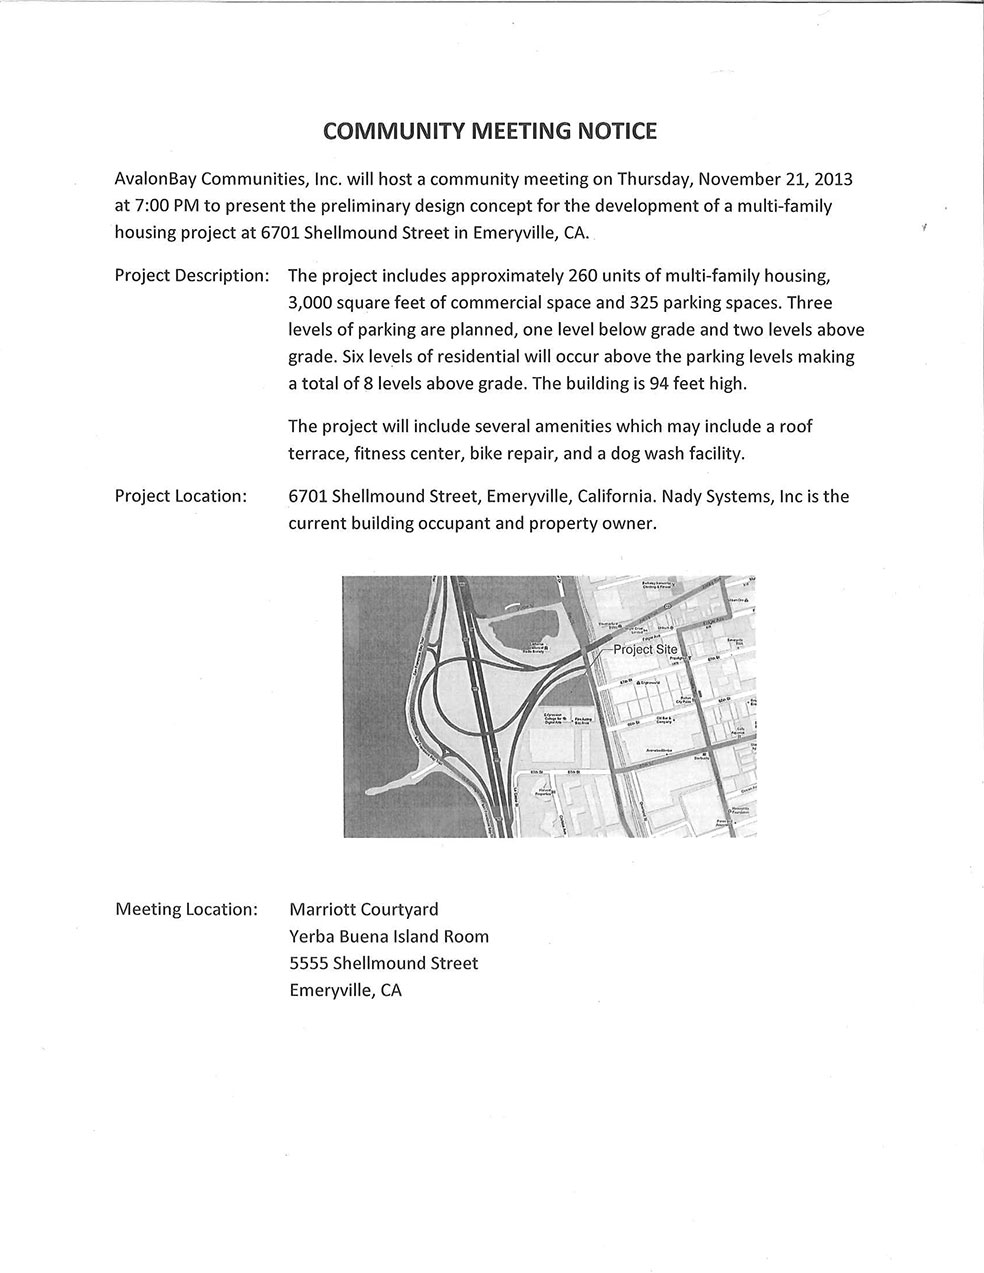 Avalon Bay Communities New Development Community Meeting